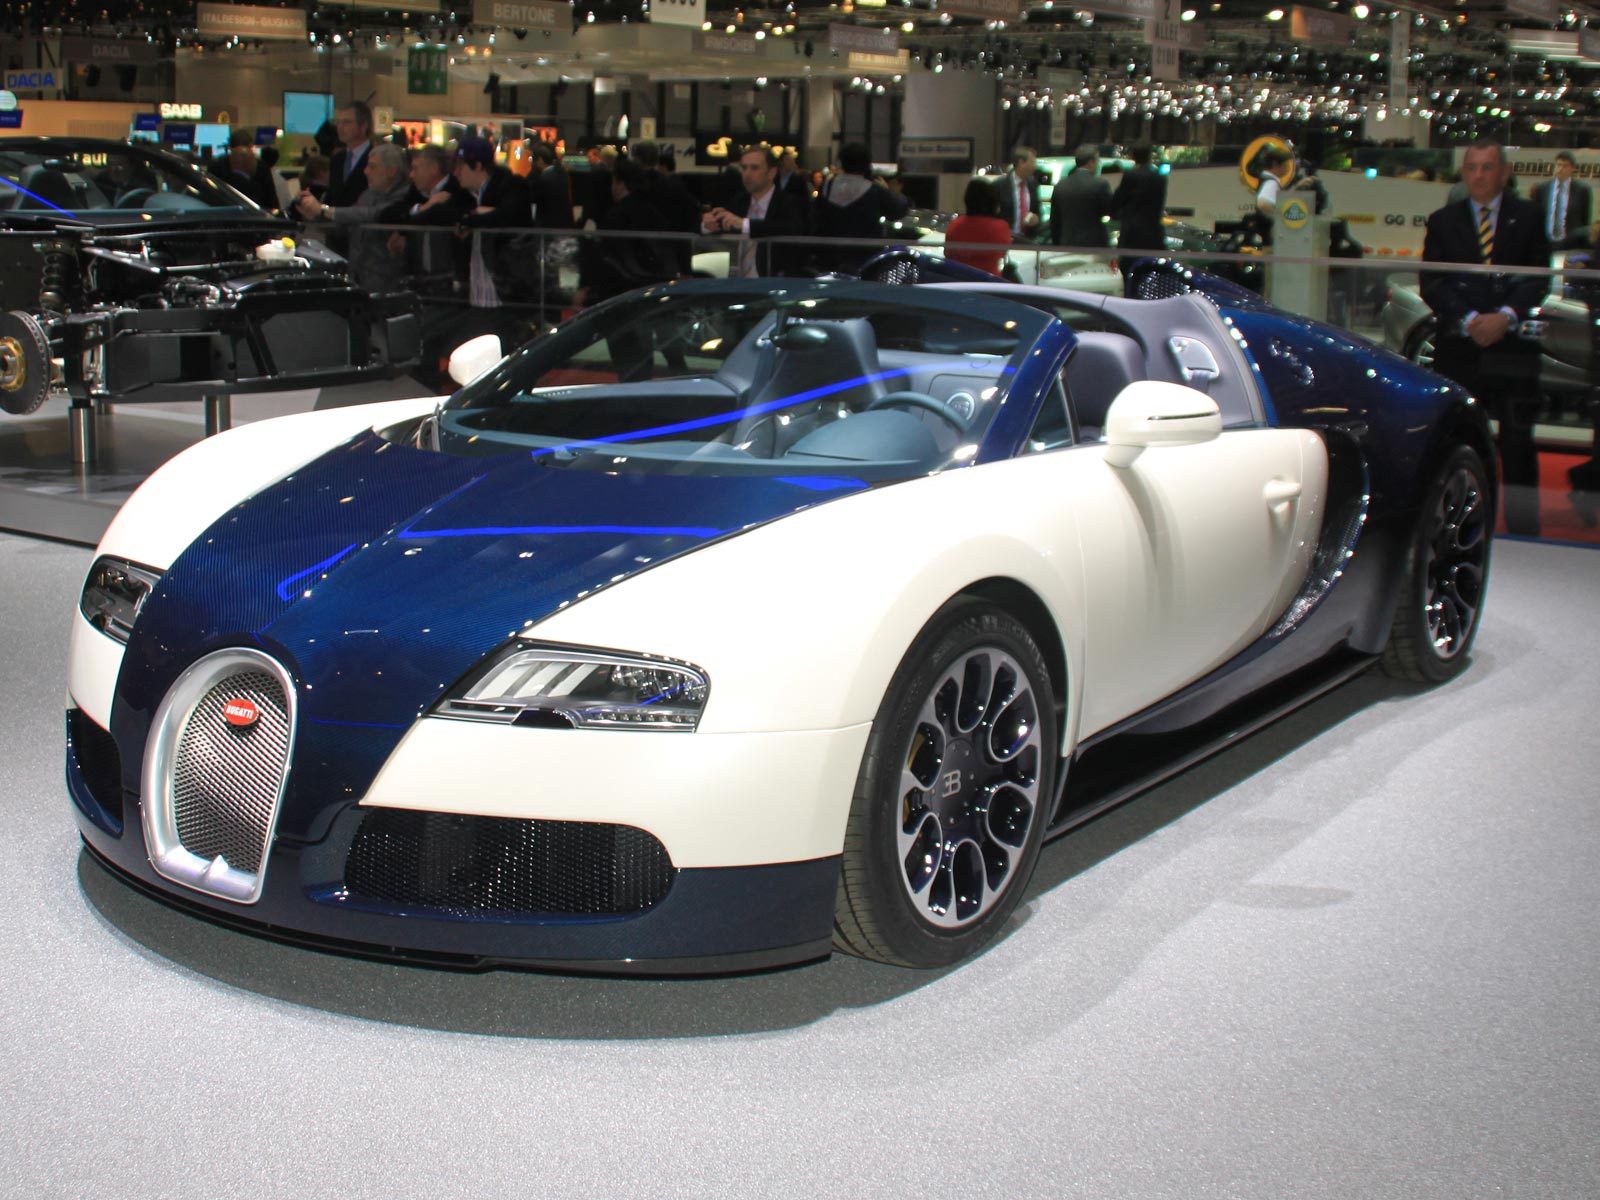 2010_roadster_4 Astounding Bugatti Veyron Grand Sport Vitesse Geschwindigkeit Cars Trend